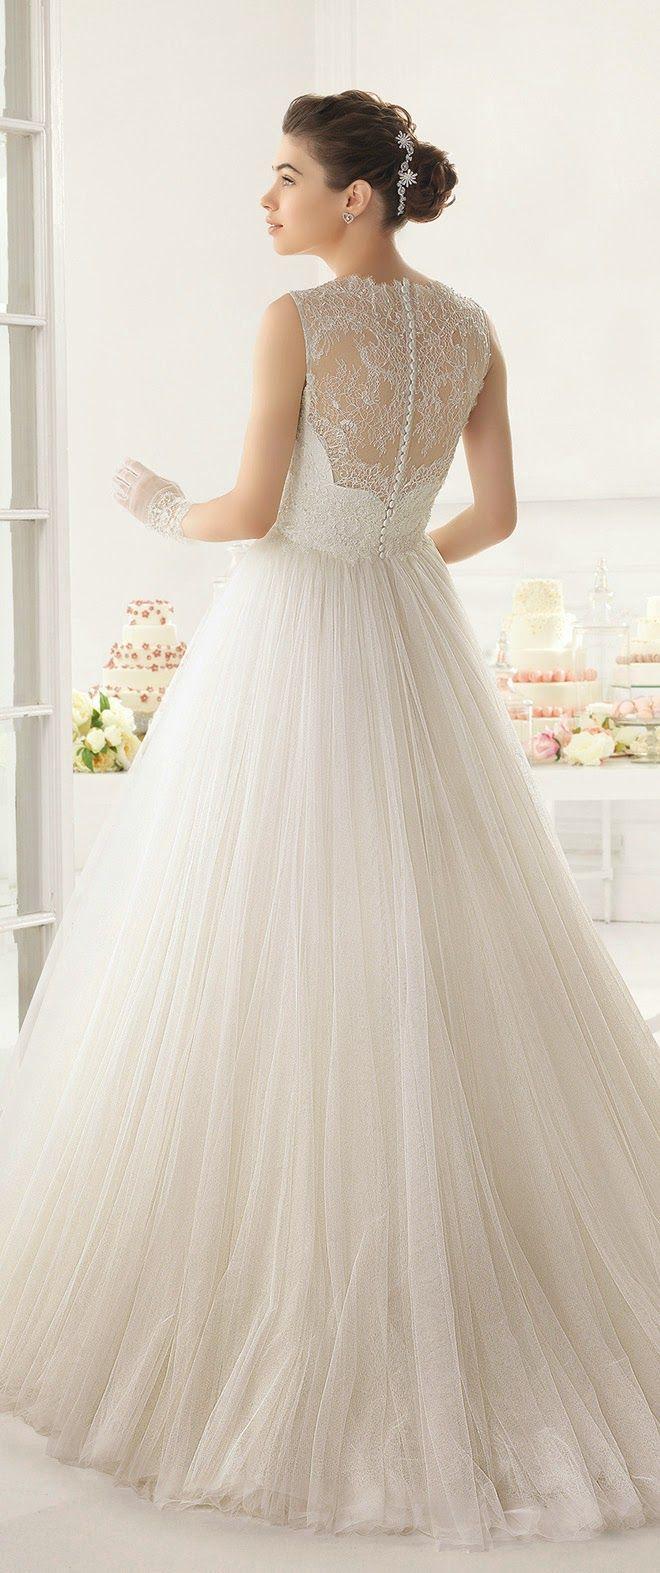 Aire barcelona wedding dresses  airebarcelonaweddingdressesCg   Me